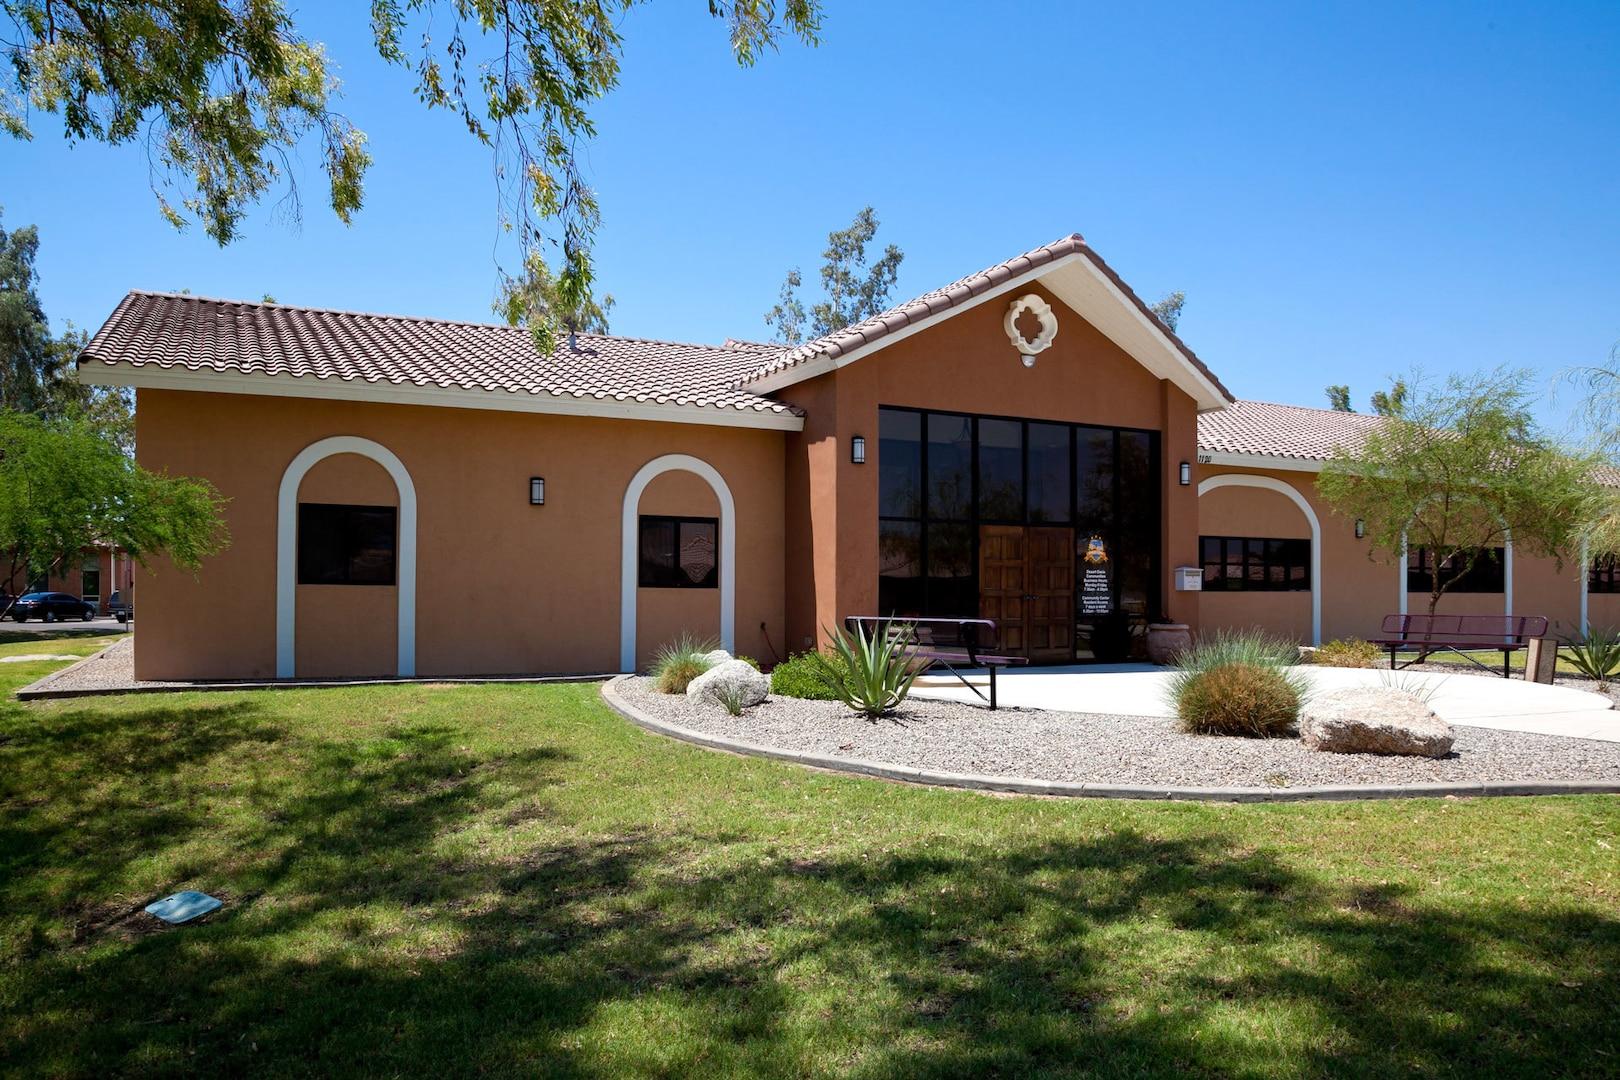 Home in the desert shown.